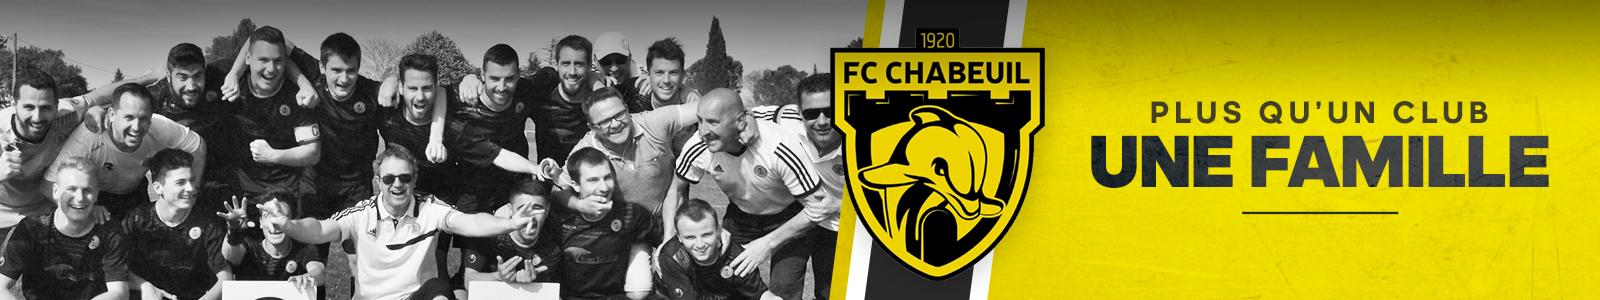 Football Club Chabeuil : site officiel du club de foot de CHABEUIL - footeo